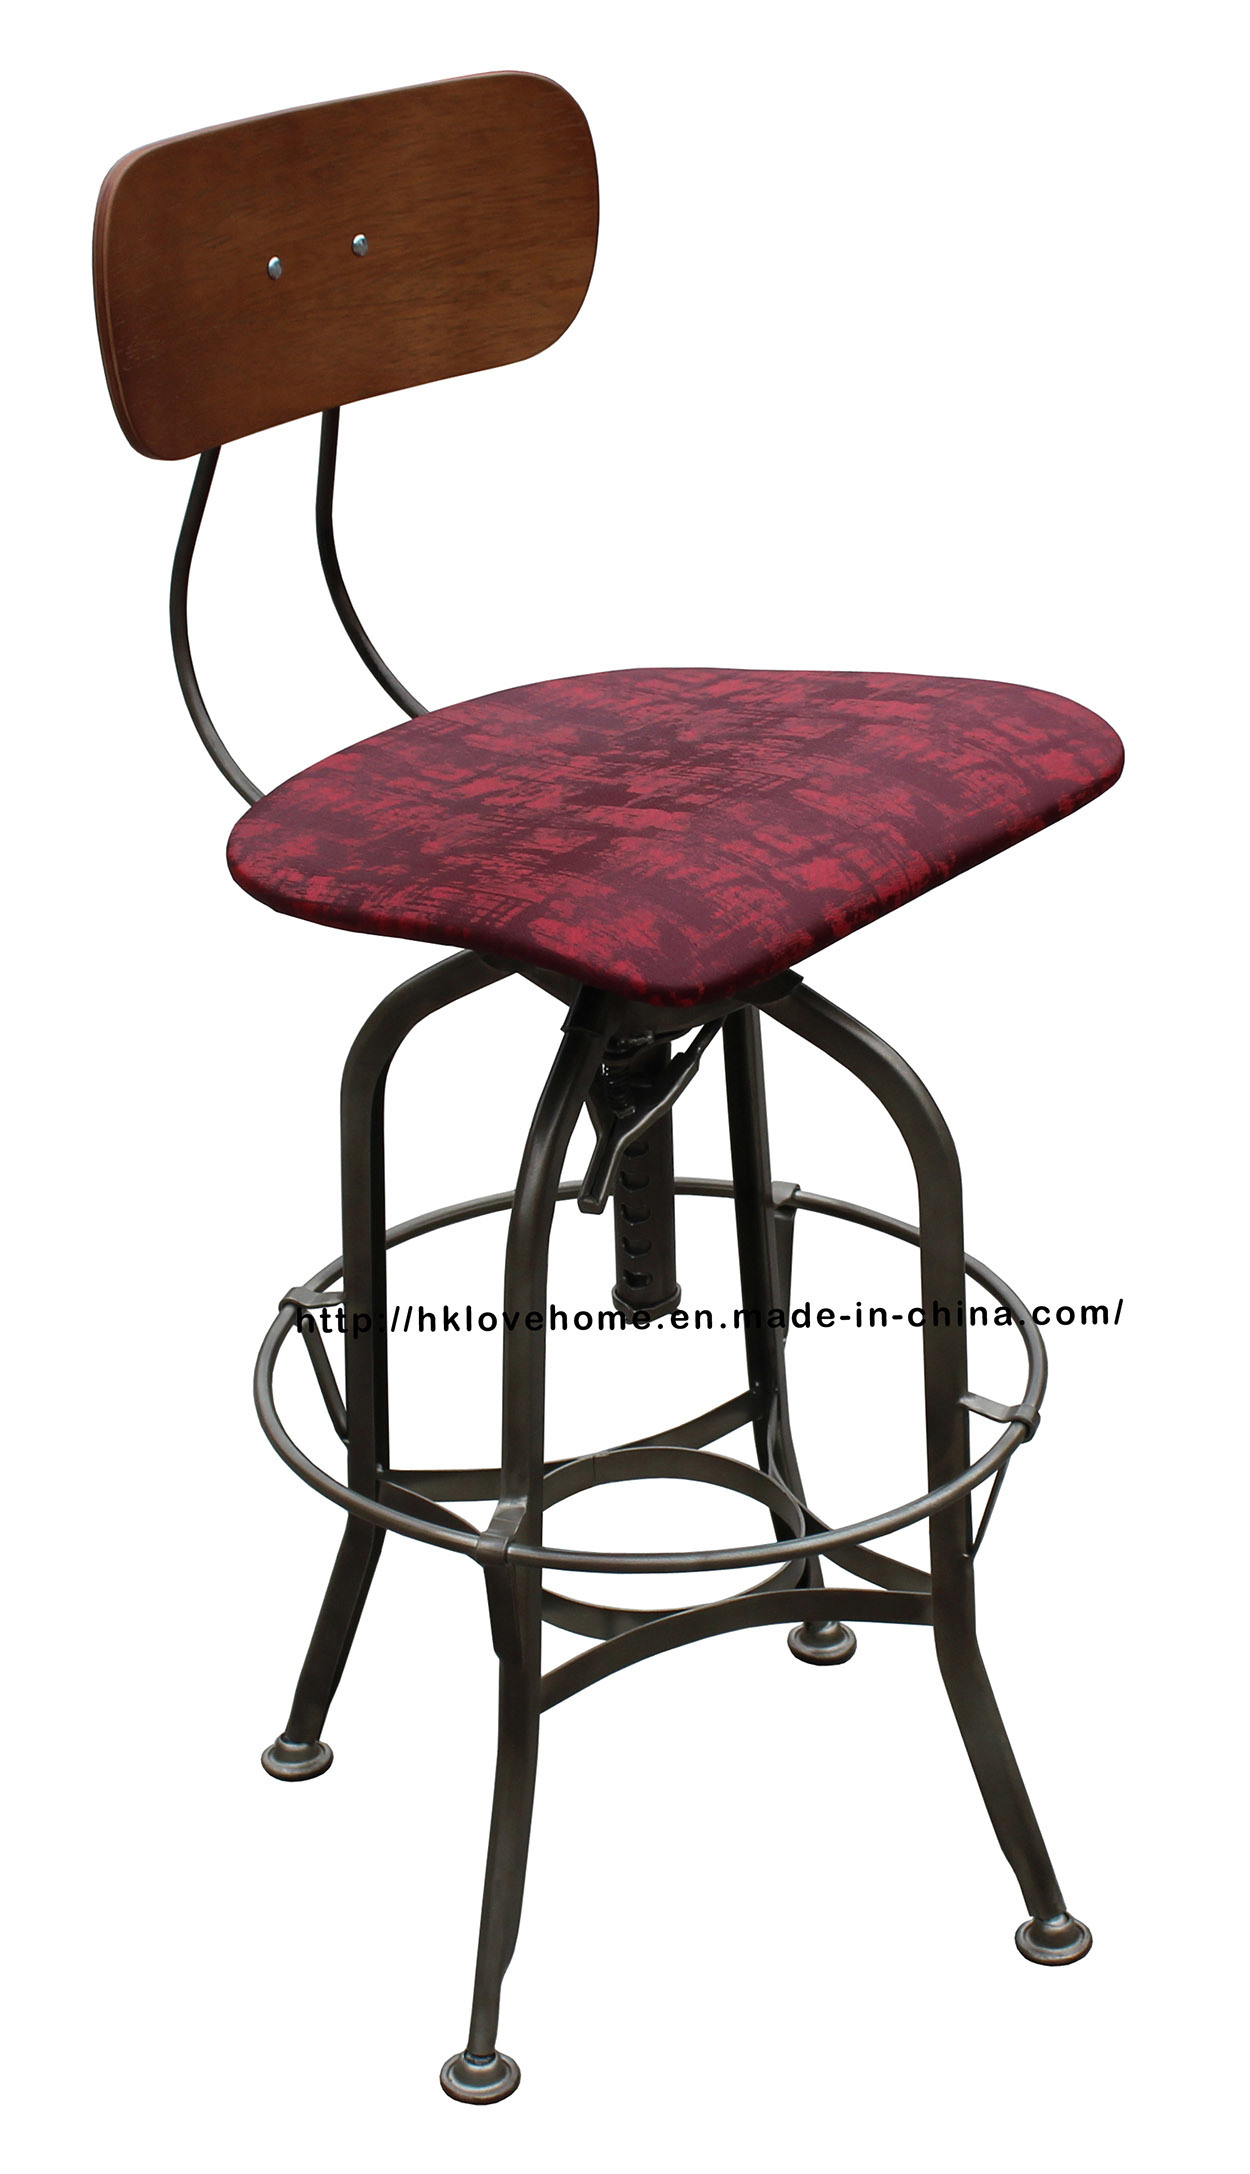 Phenomenal Hot Item Replica Industrial Metal Restaurant Furniture Toledo Bar Stools Chair Short Links Chair Design For Home Short Linksinfo